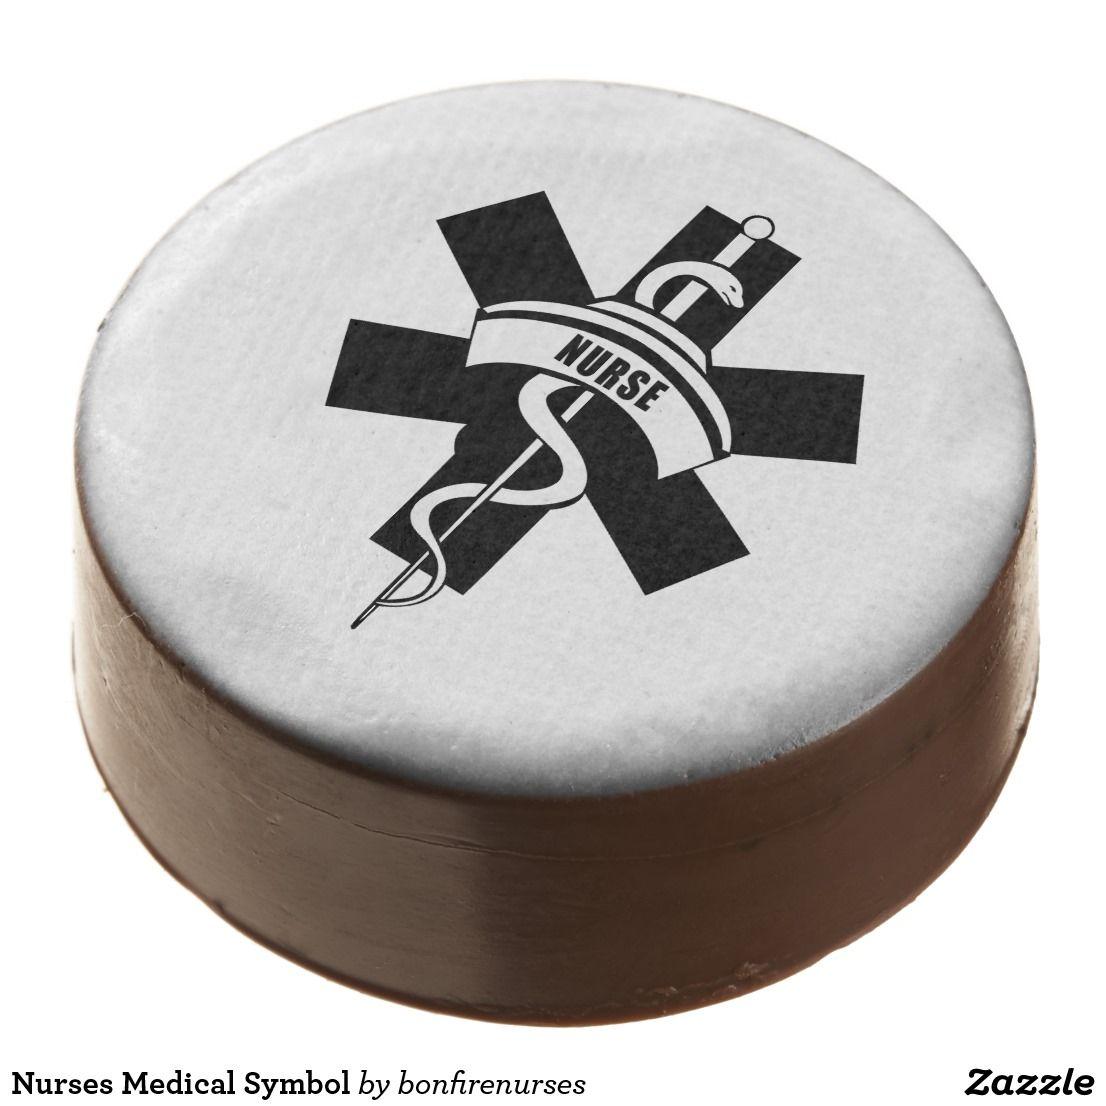 Nurses Medical Symbol Chocolate Covered Oreo Nurse Dedication